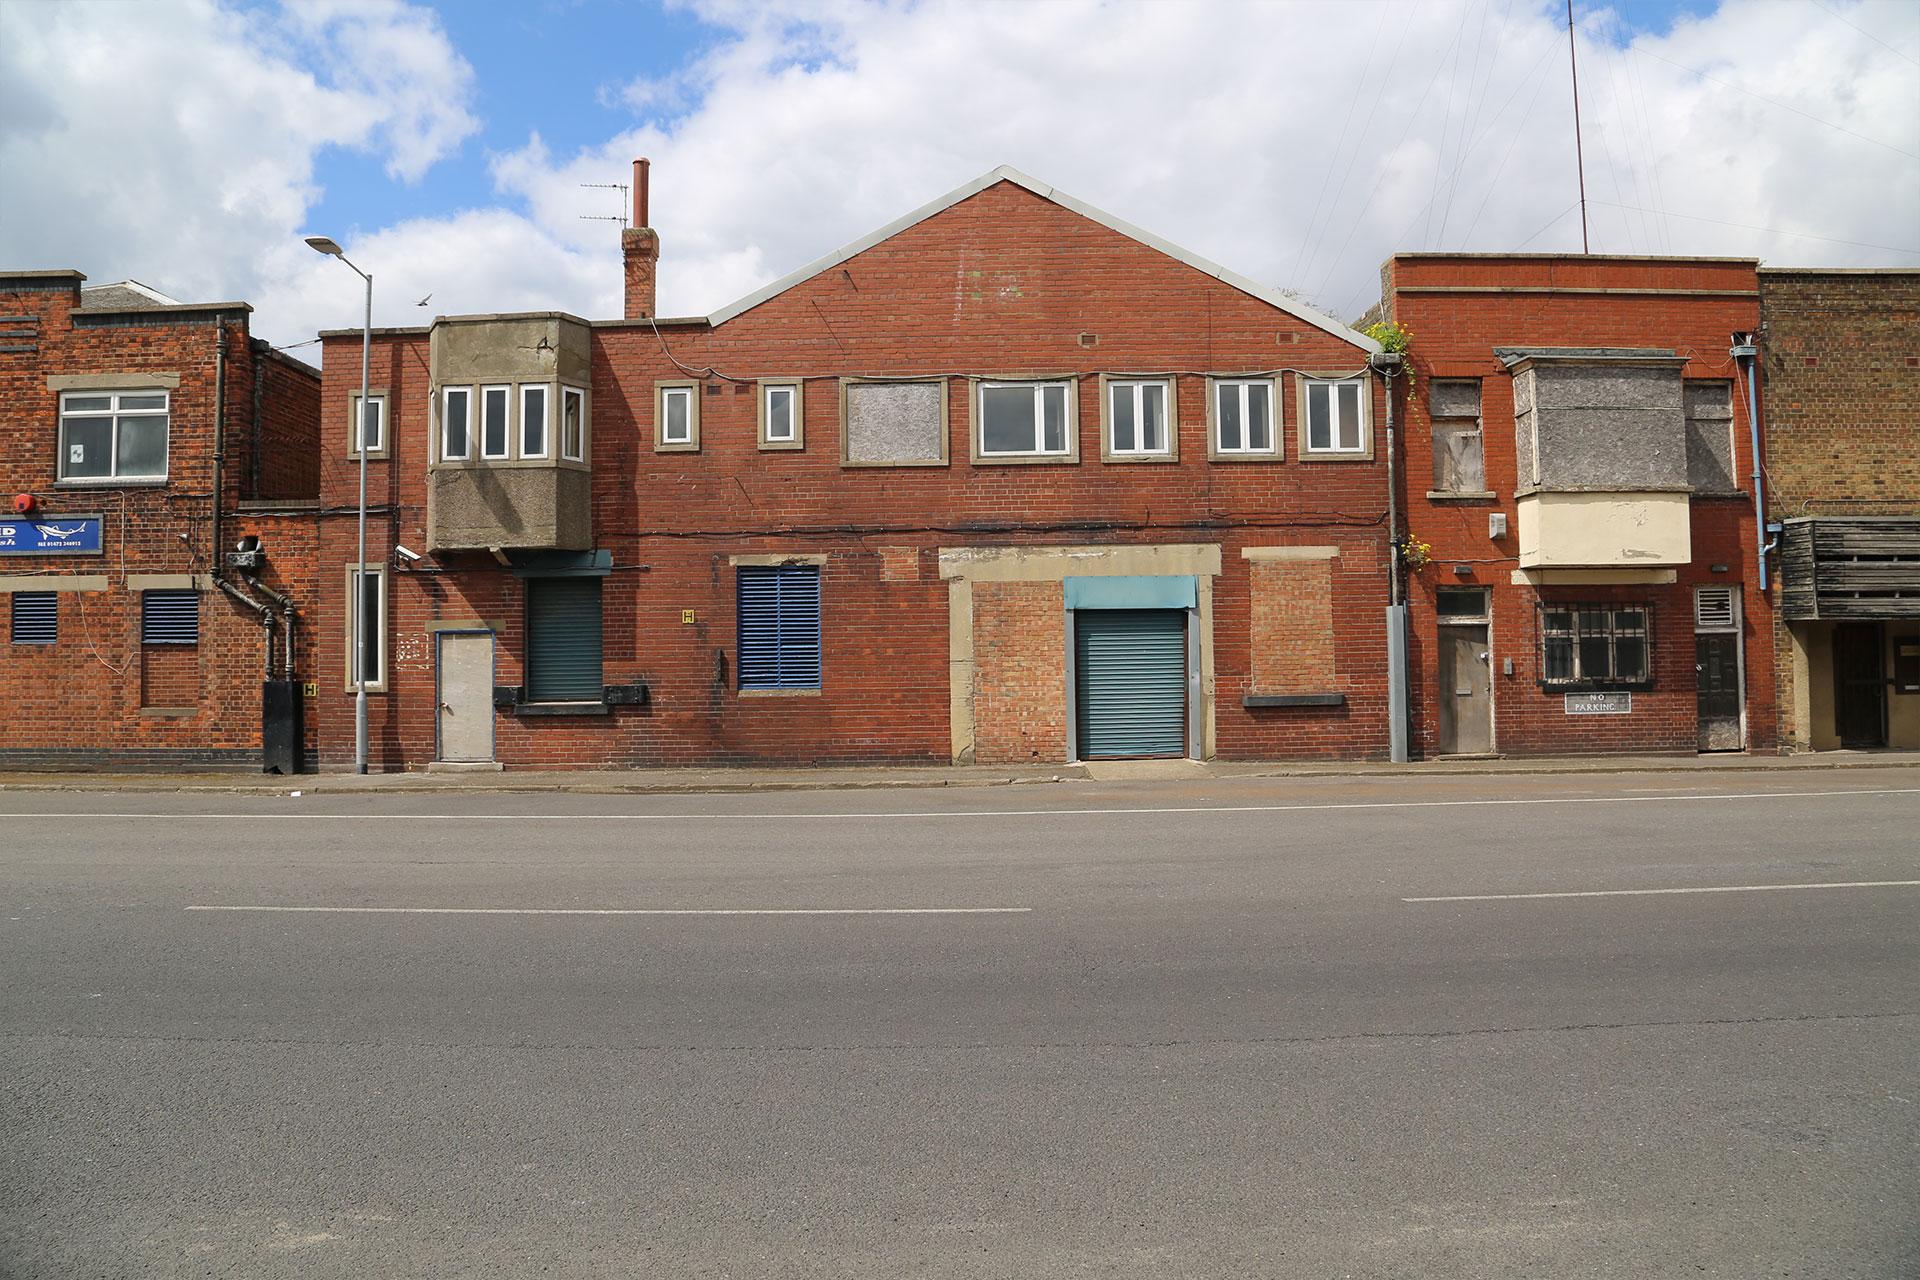 Kasbah building exterior